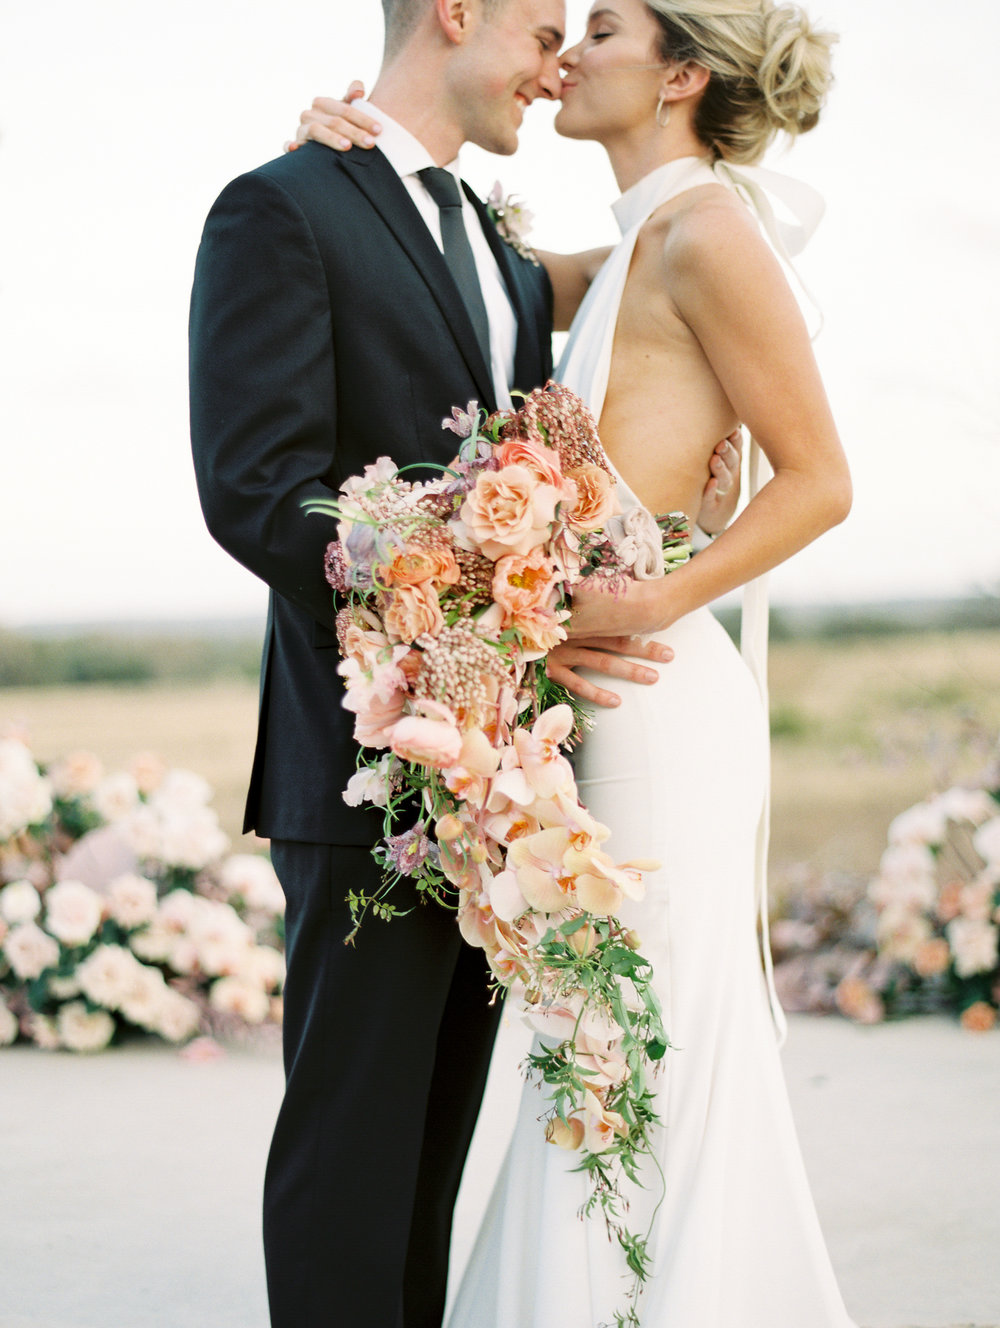 Austin-Wedding-Photography-Prospect-House-Fine-Art-Film-Destination-Dana-Josh-Fernandez-Photography-Dallas-Houston-Luxury-Best-Top-11.jpg